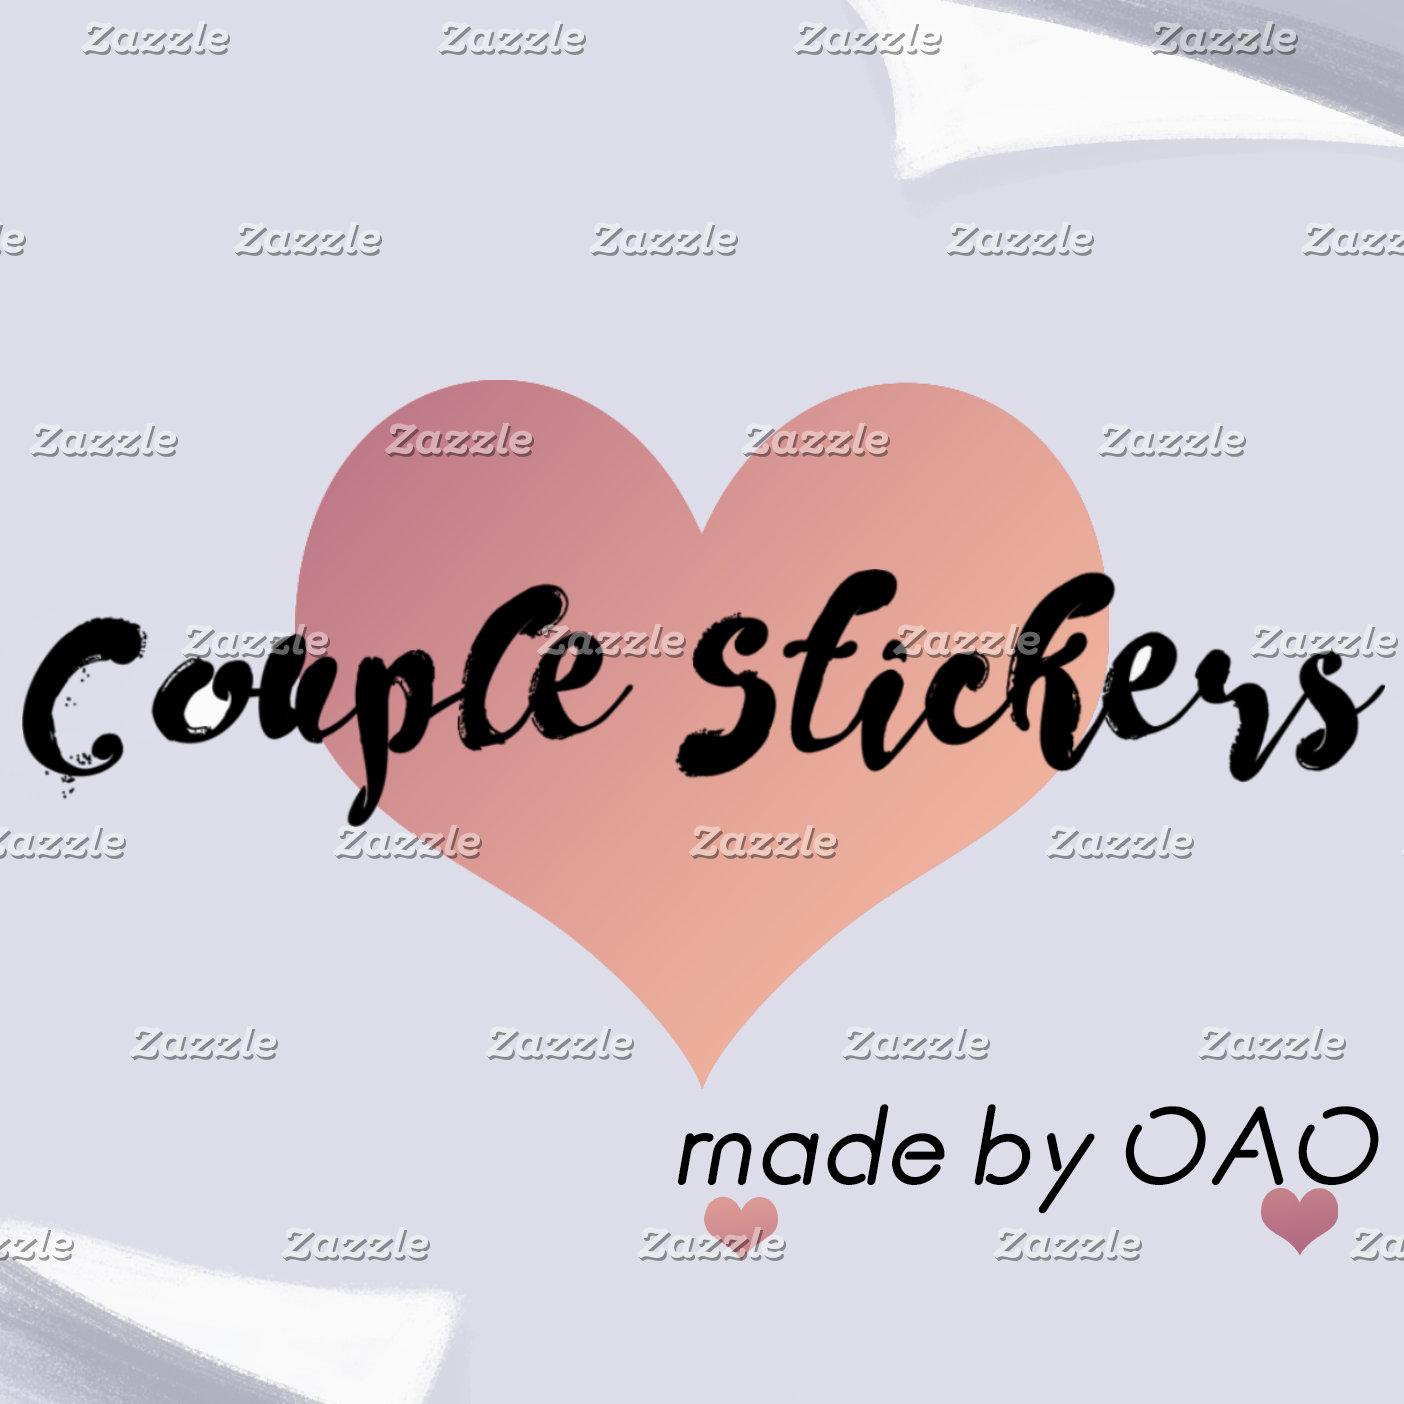 Couple stickers